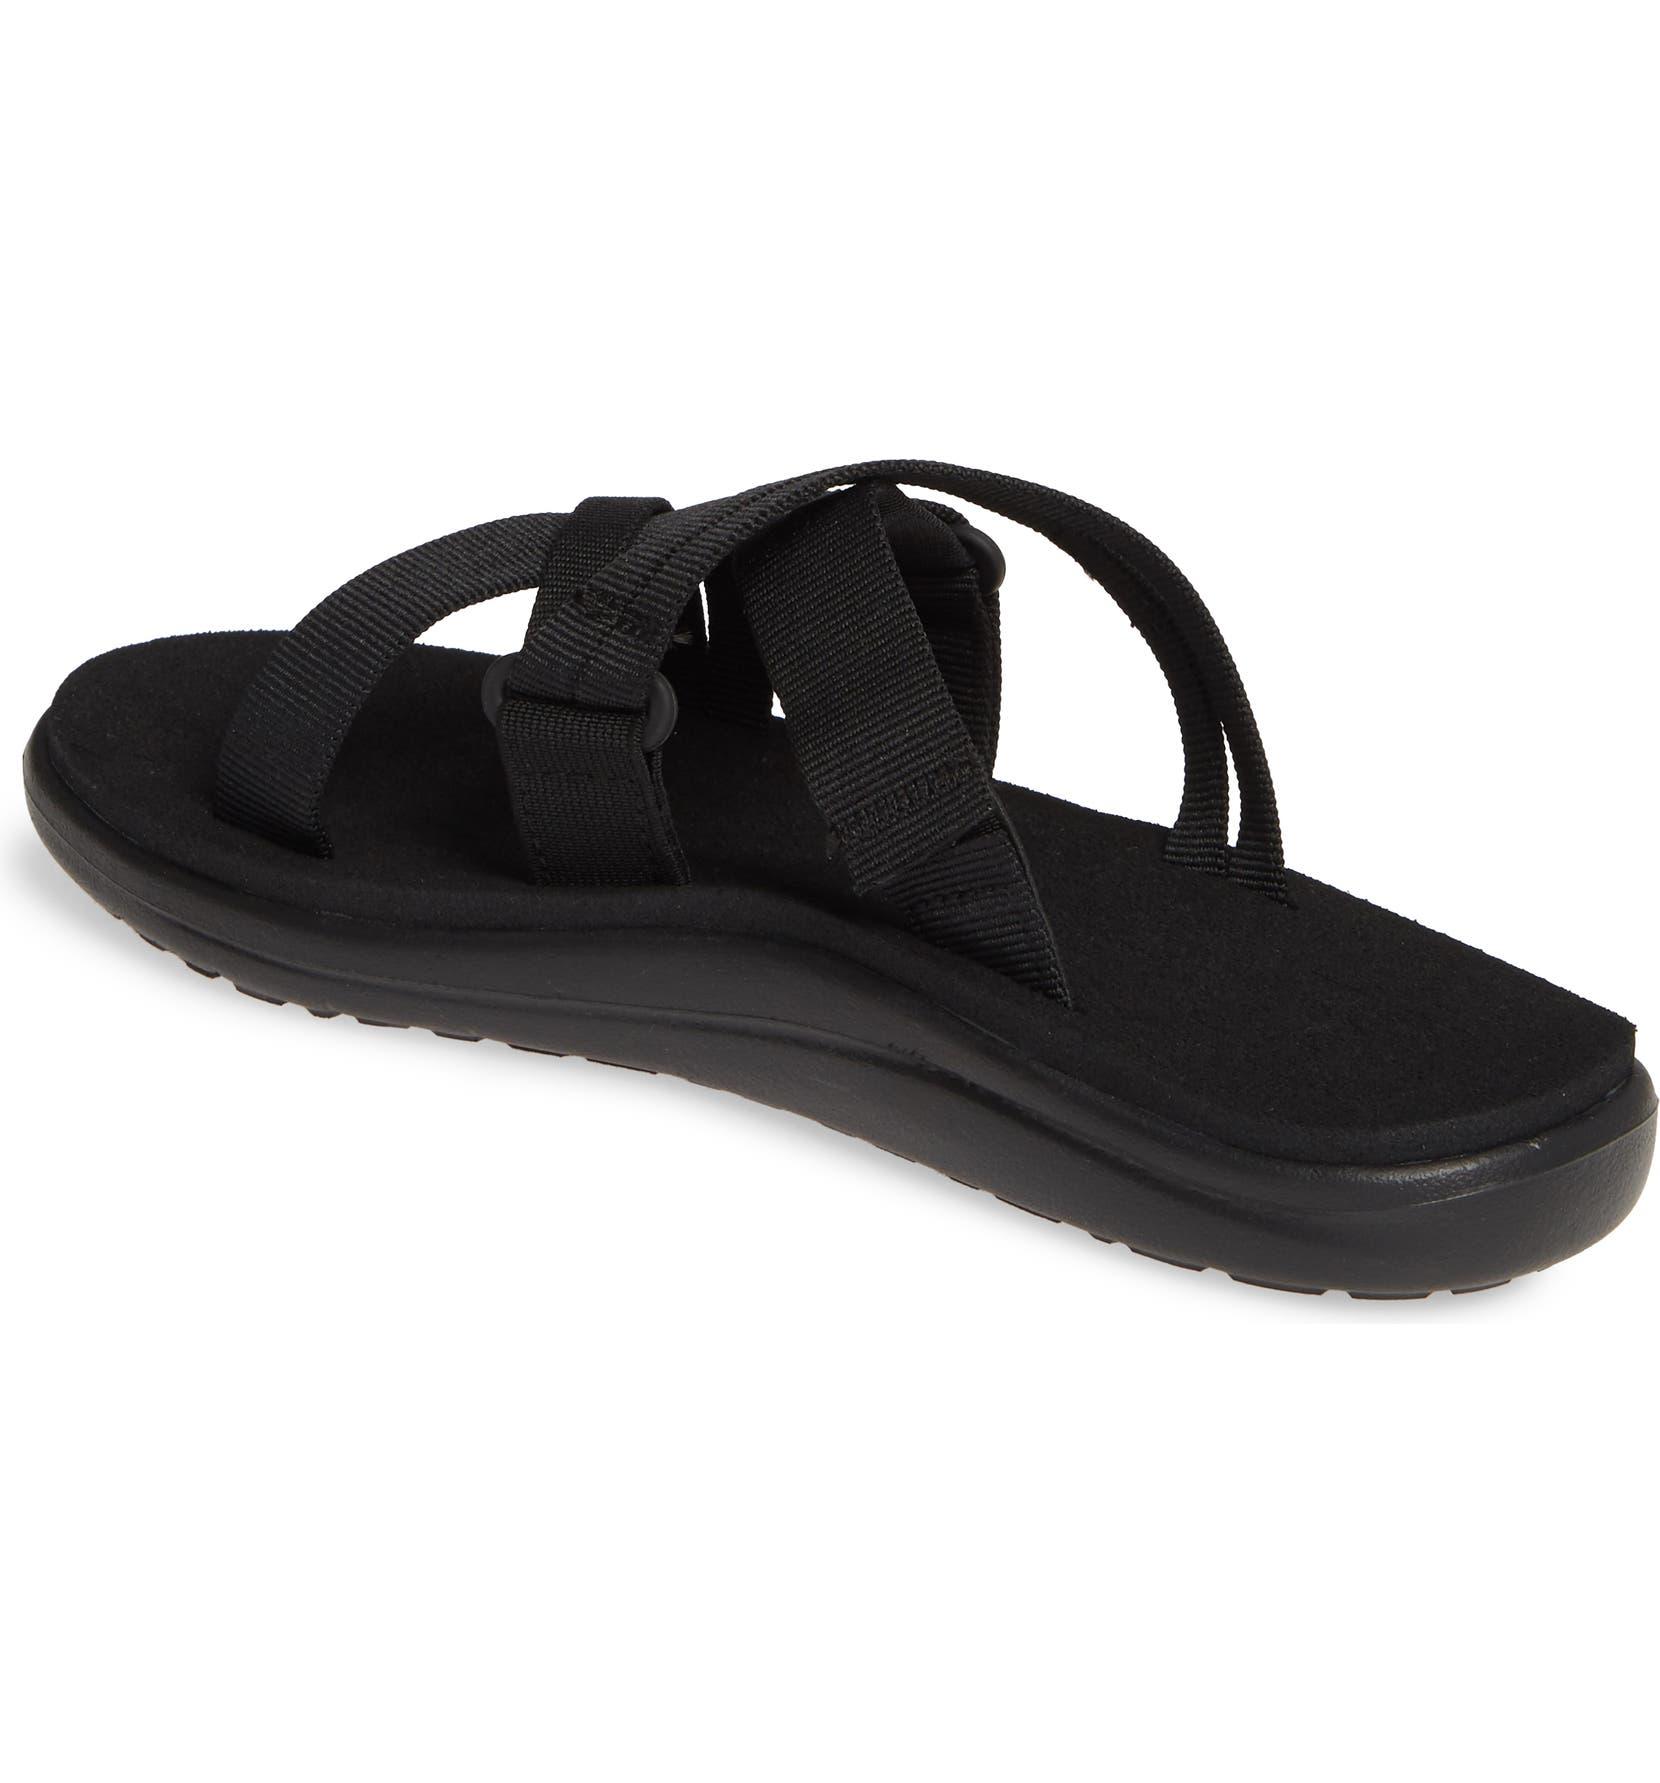 dd0dfb13725dd5 Teva Voya Infinity Water Friendly Slide Sandal (Women)